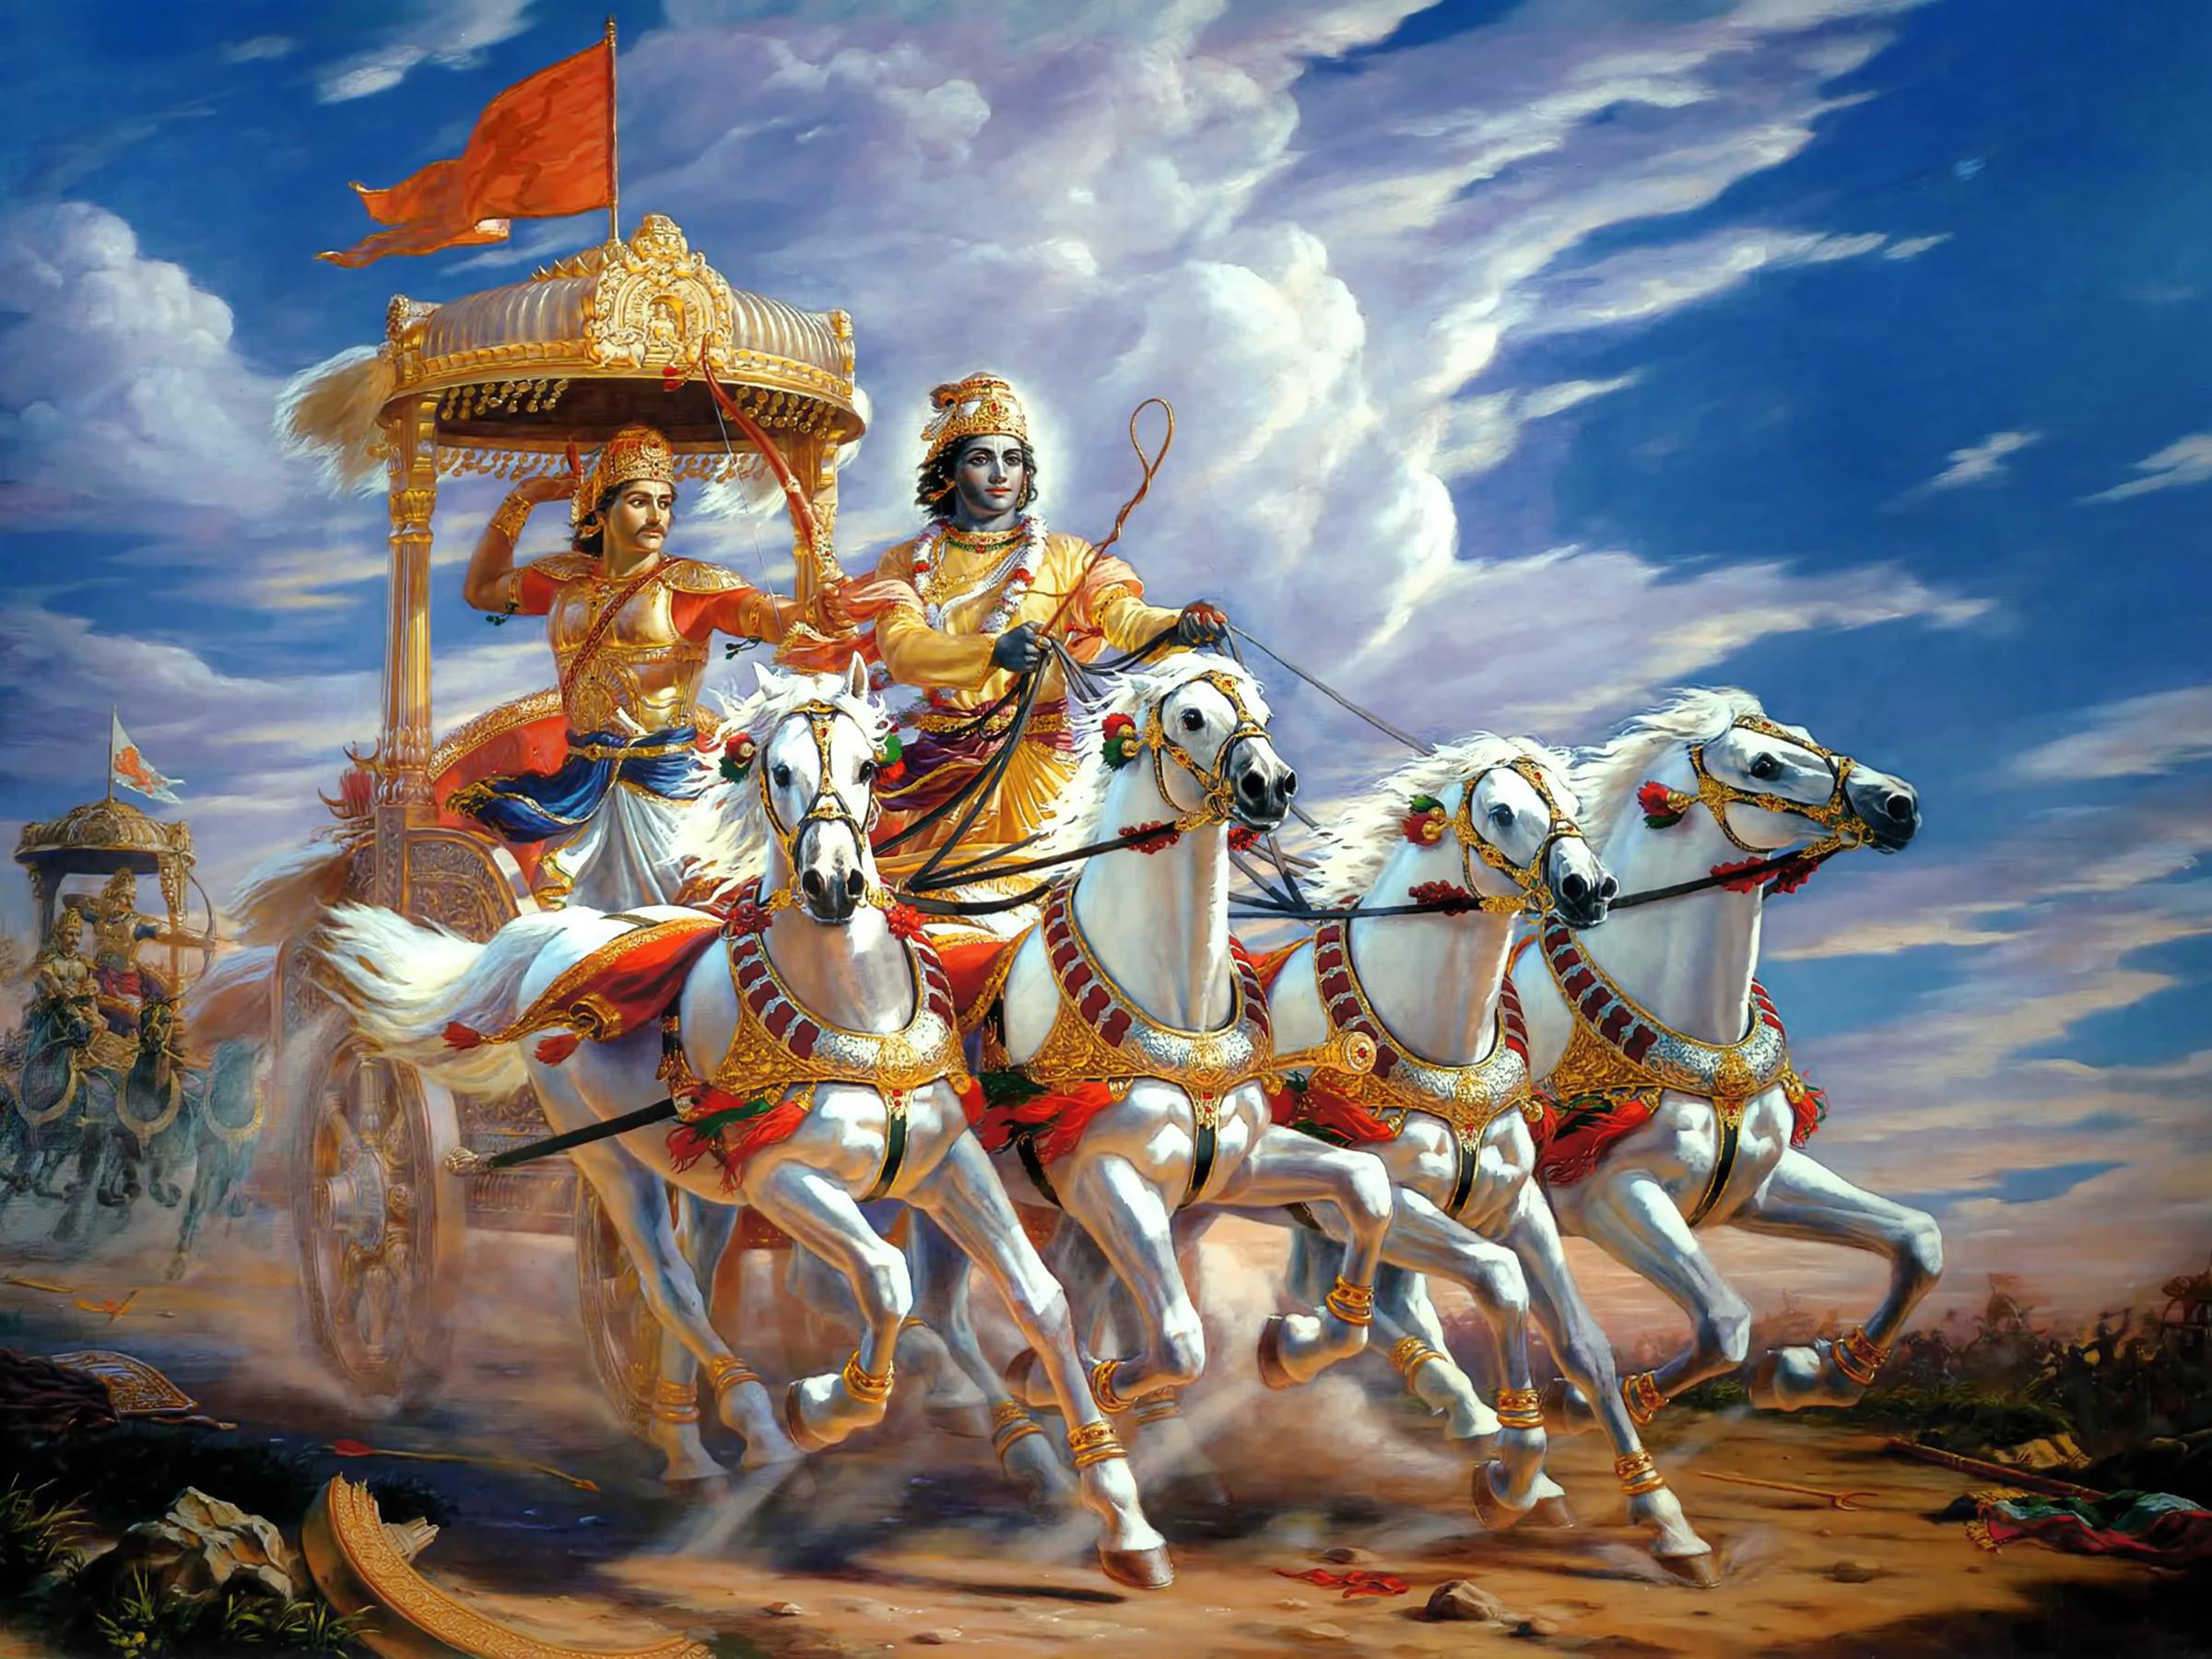 Bhagavad Gita Quotes By Krishna - BhagavadGita.io